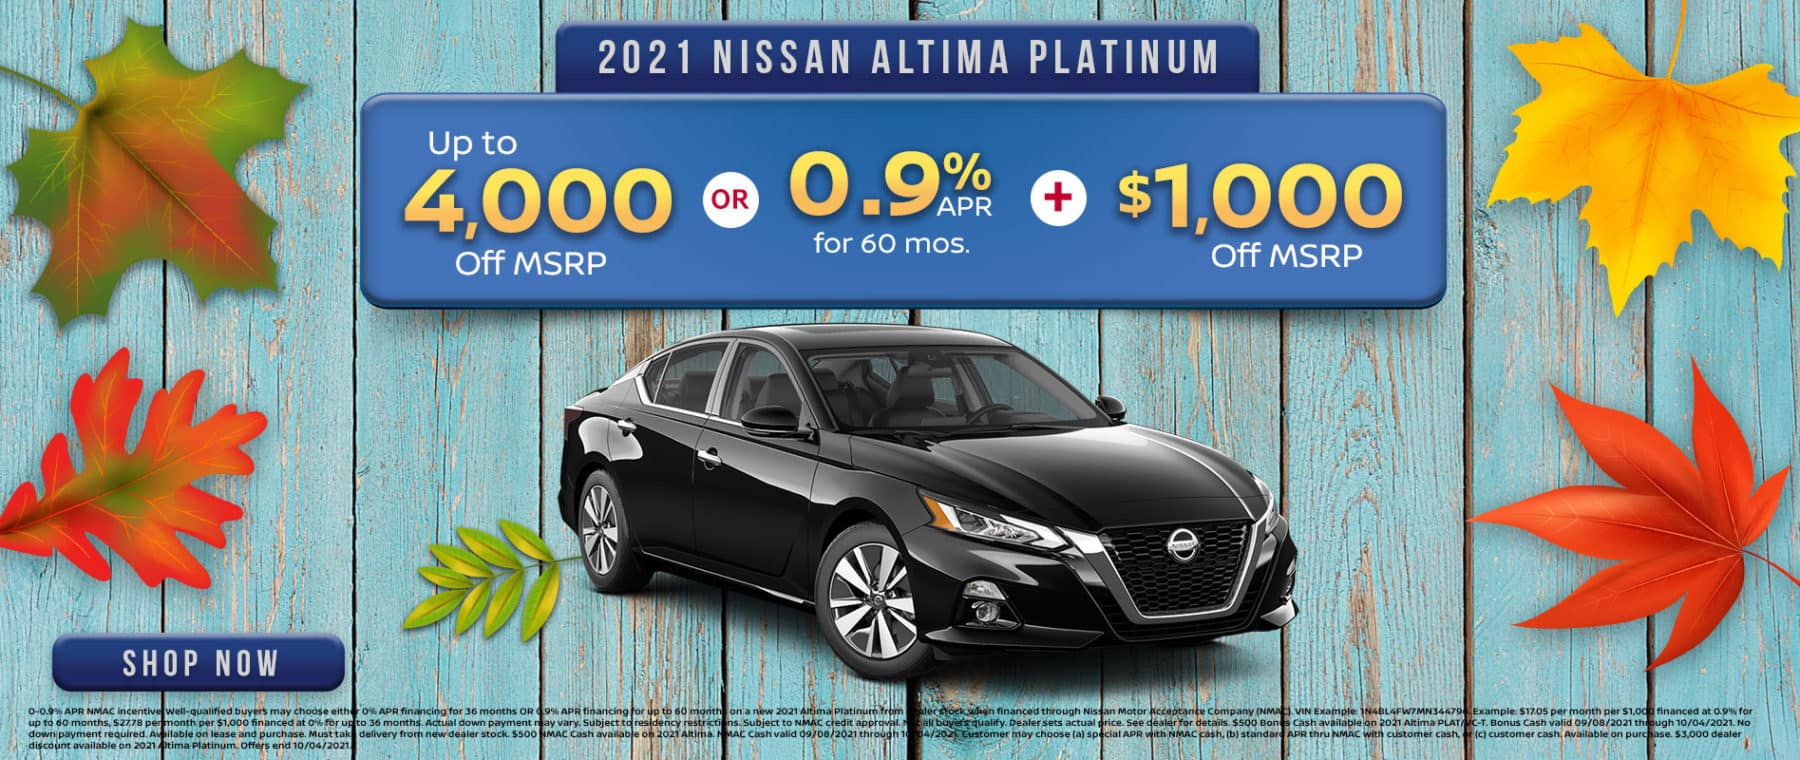 2021 Nissan Altima Offer in Greenville, TX